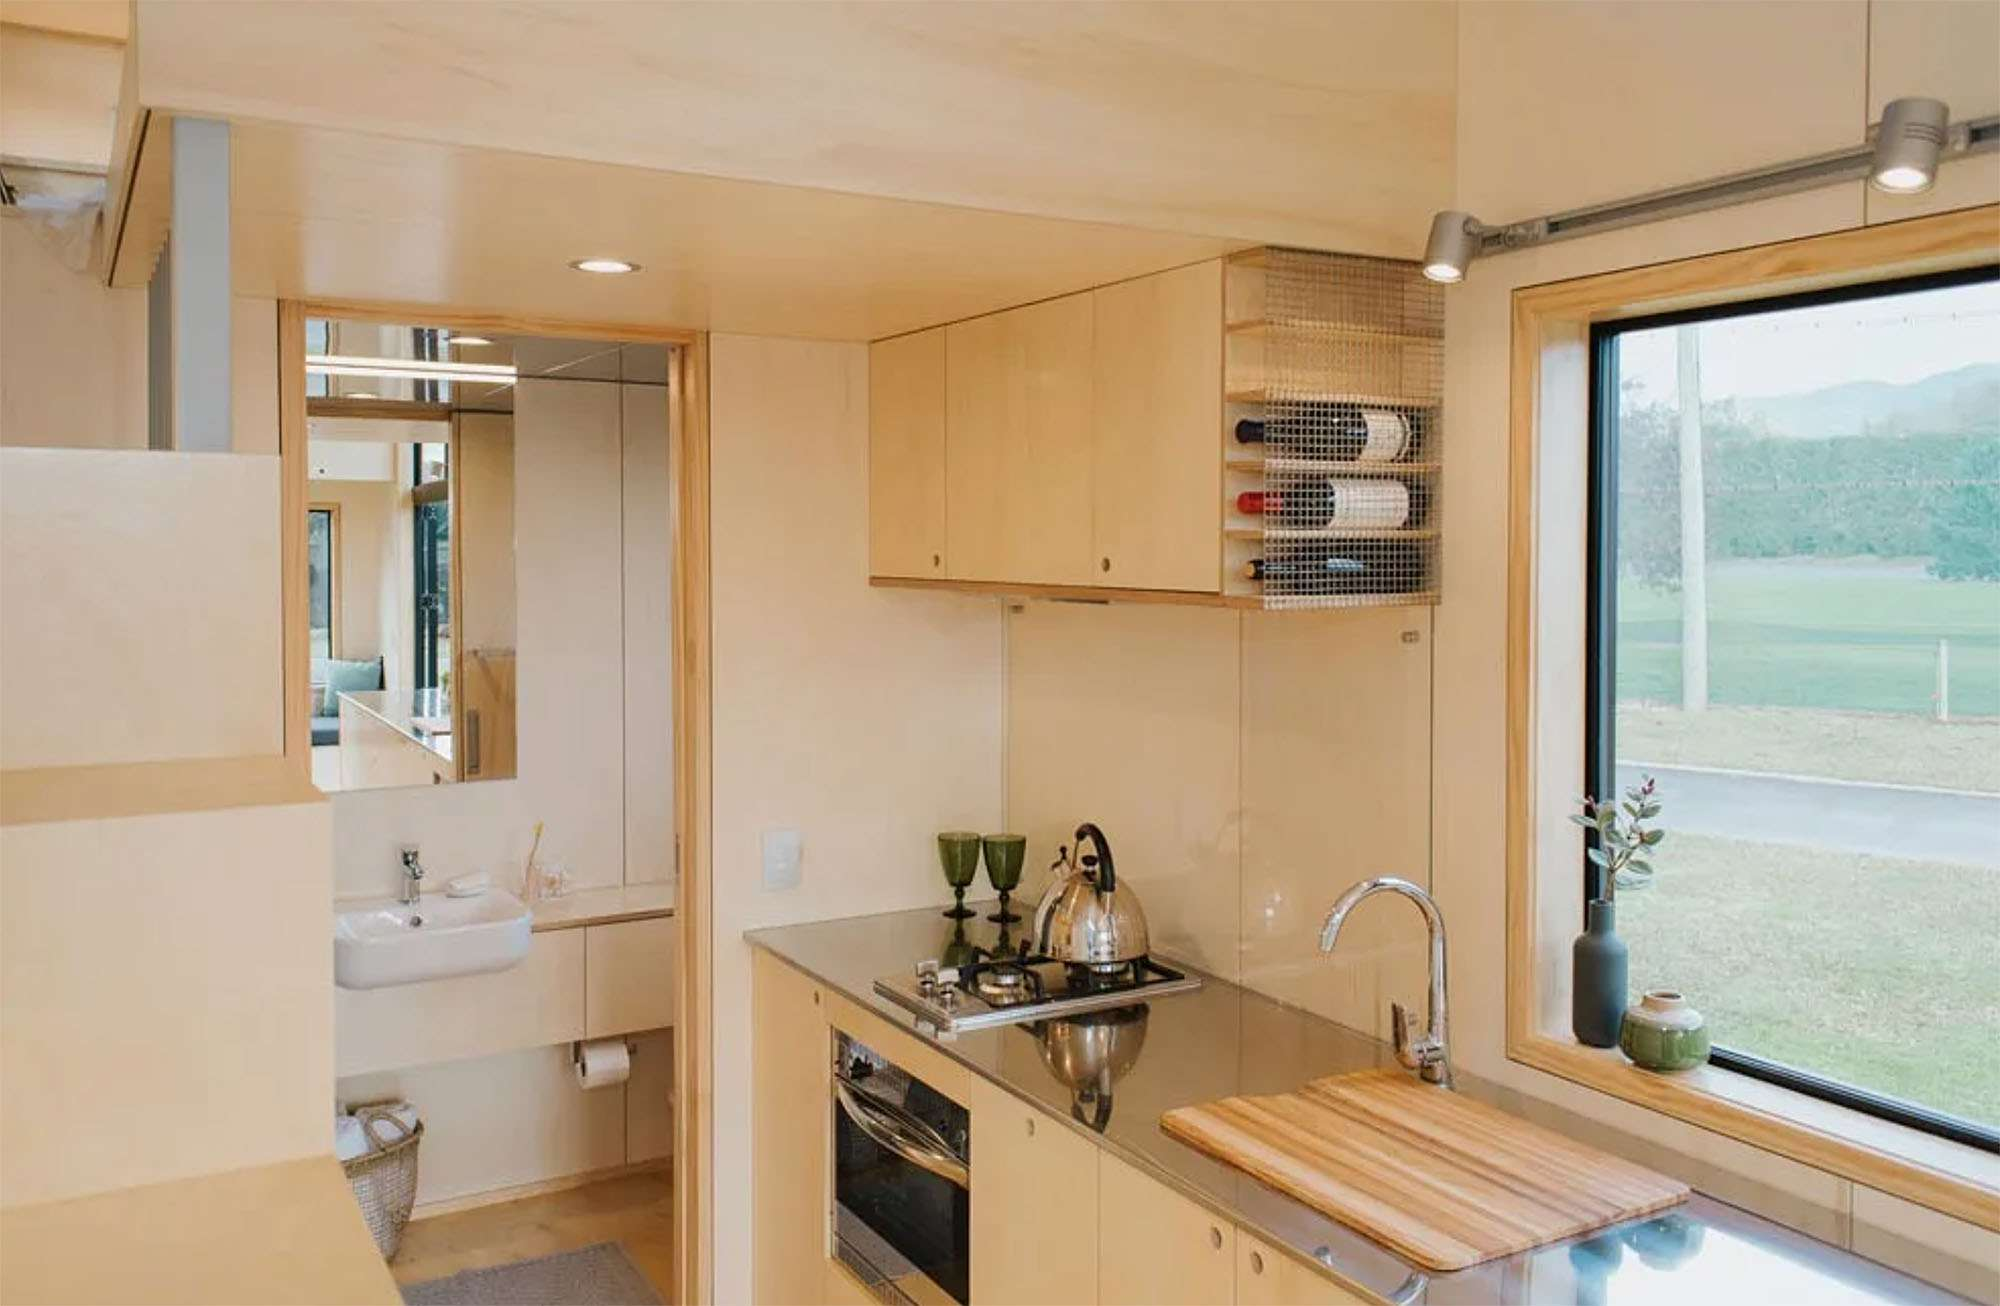 Ohariu tiny house by First Light Studio and Build Tiny kitchen